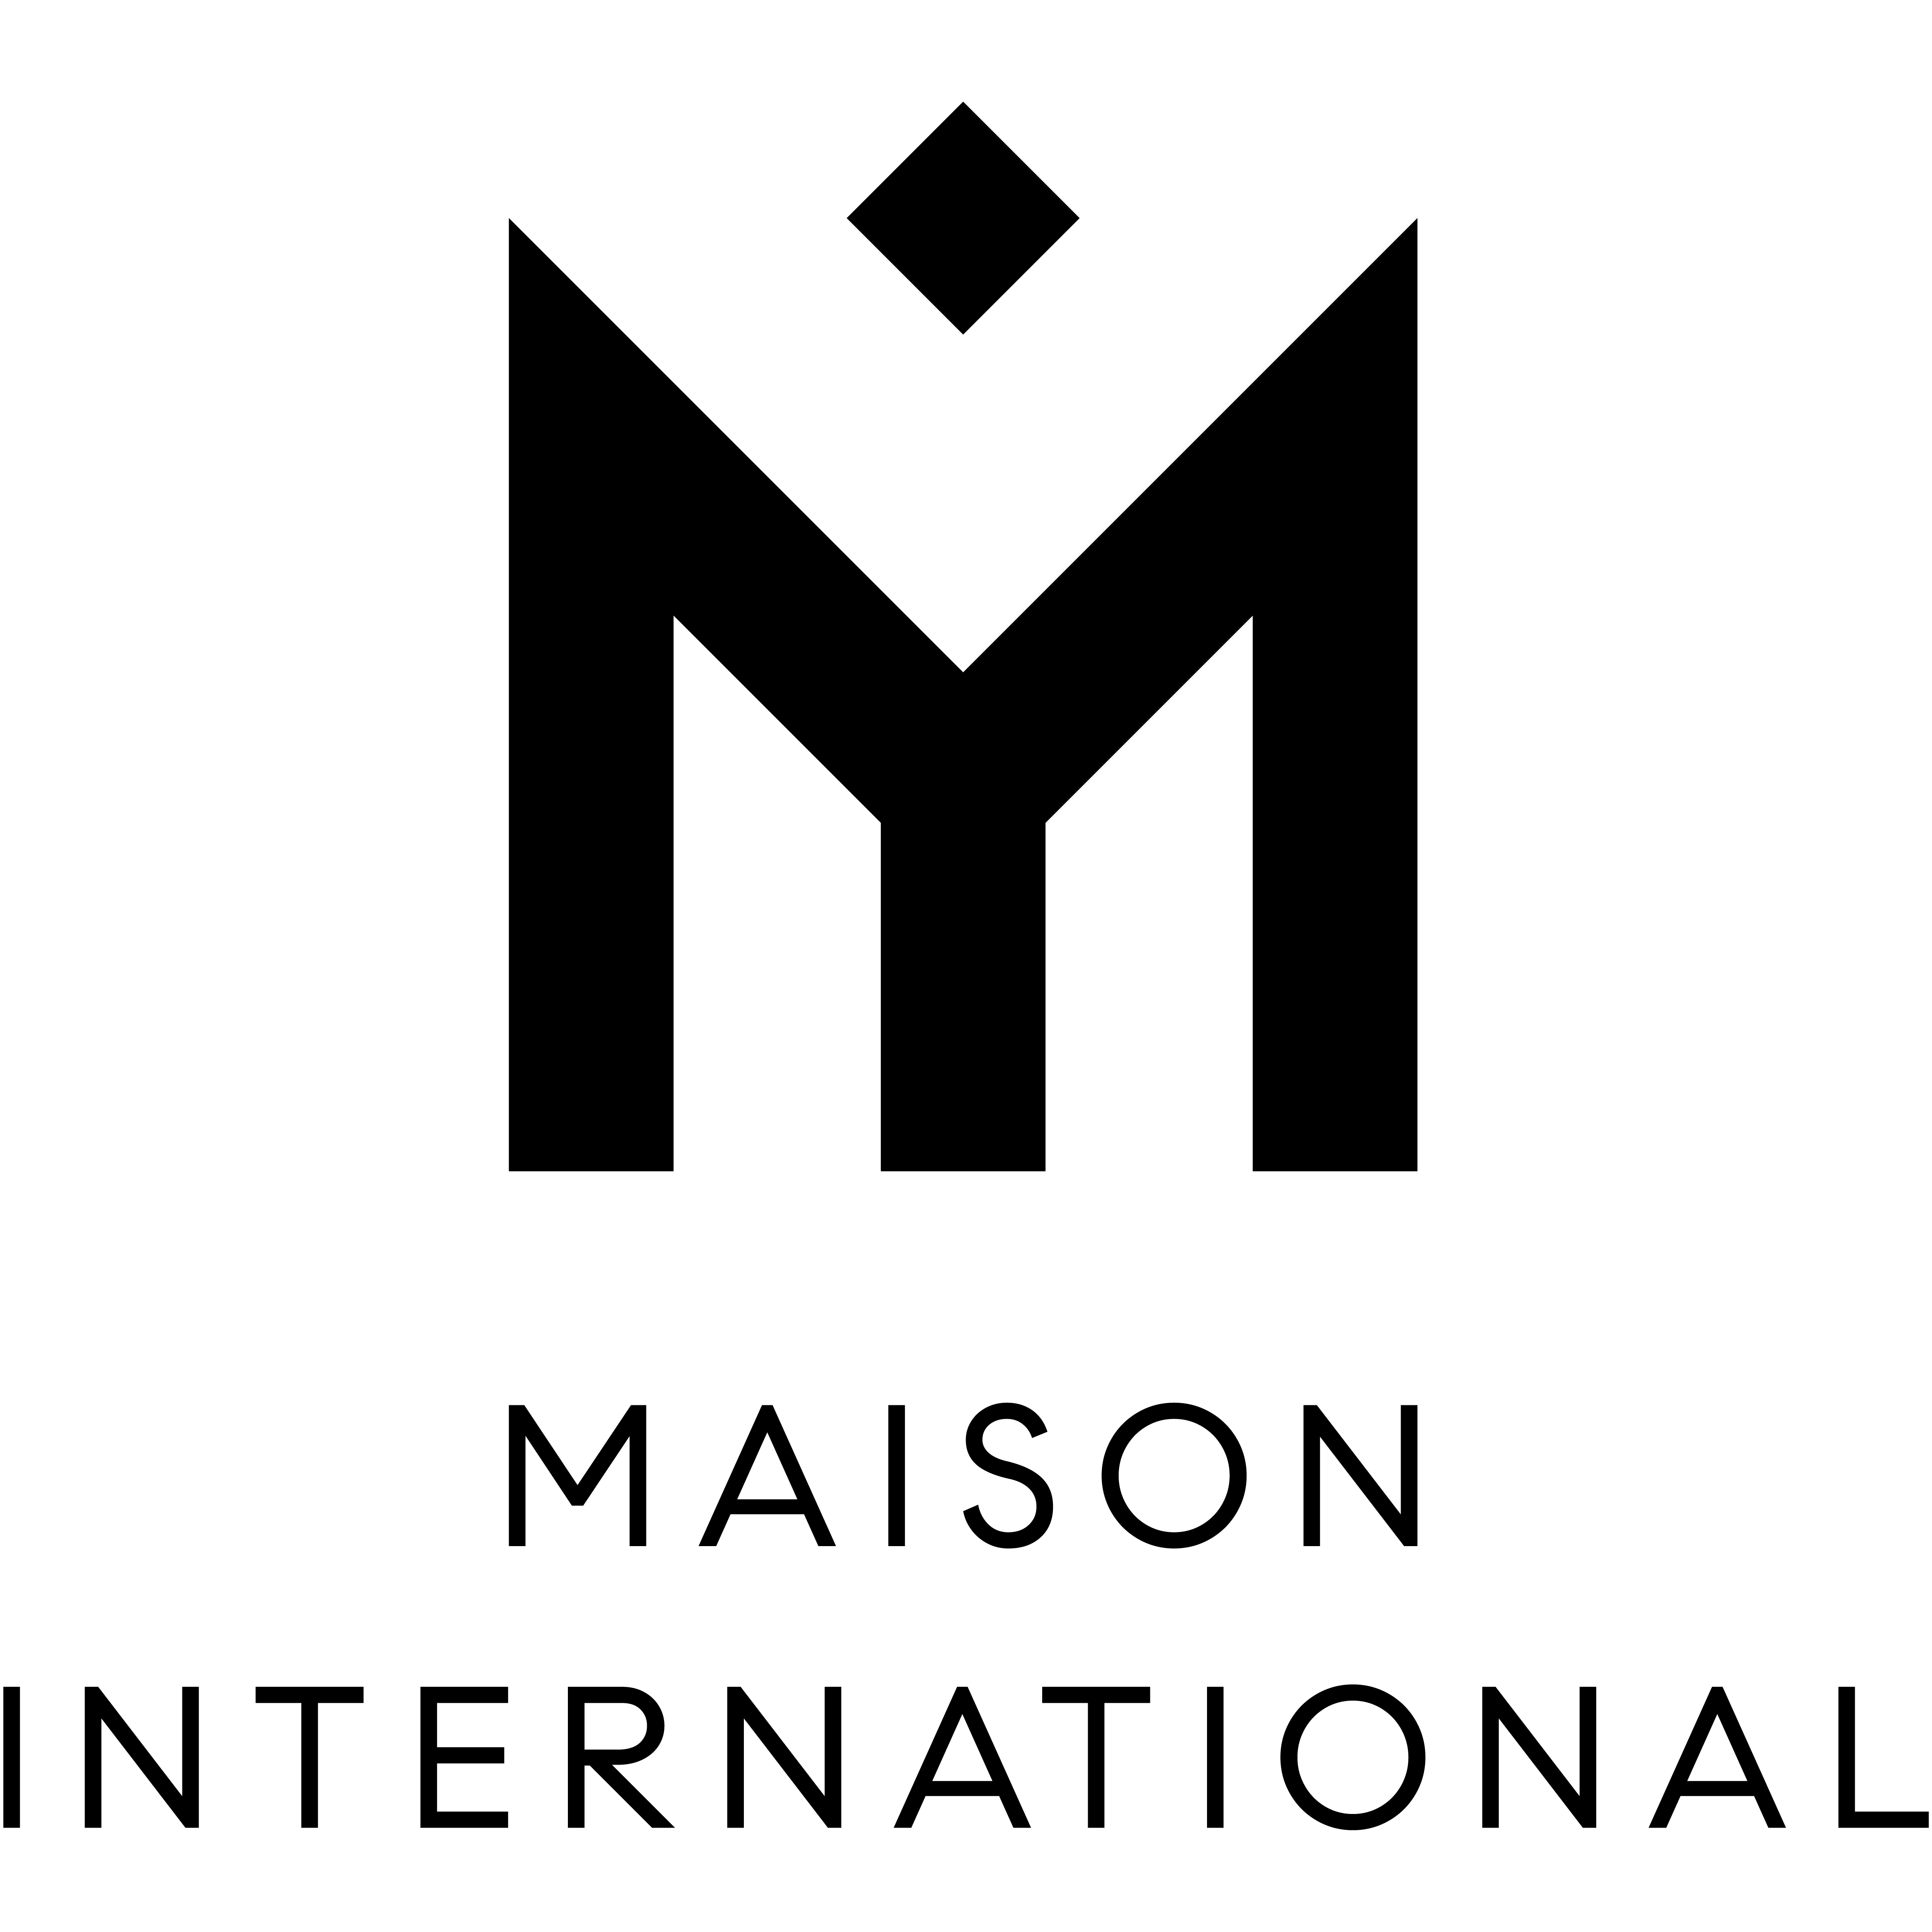 The Maison International Team at Compass logo